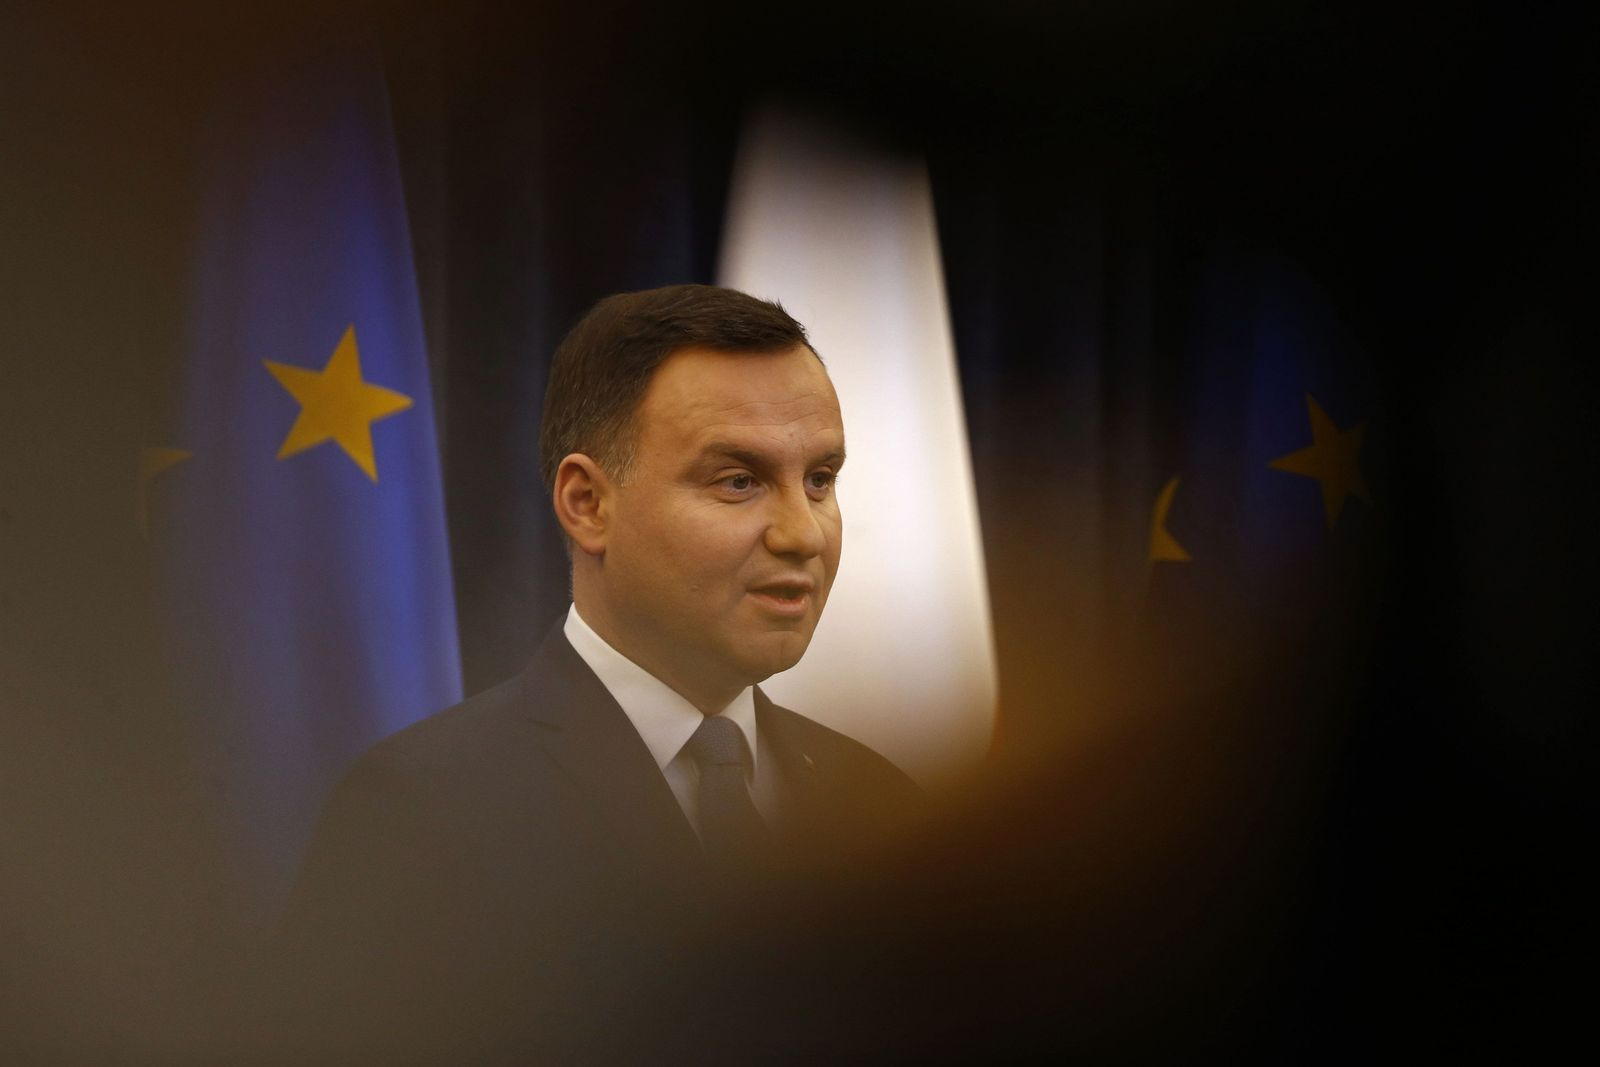 POLAND-CONSTITUTION/PRESIDENT